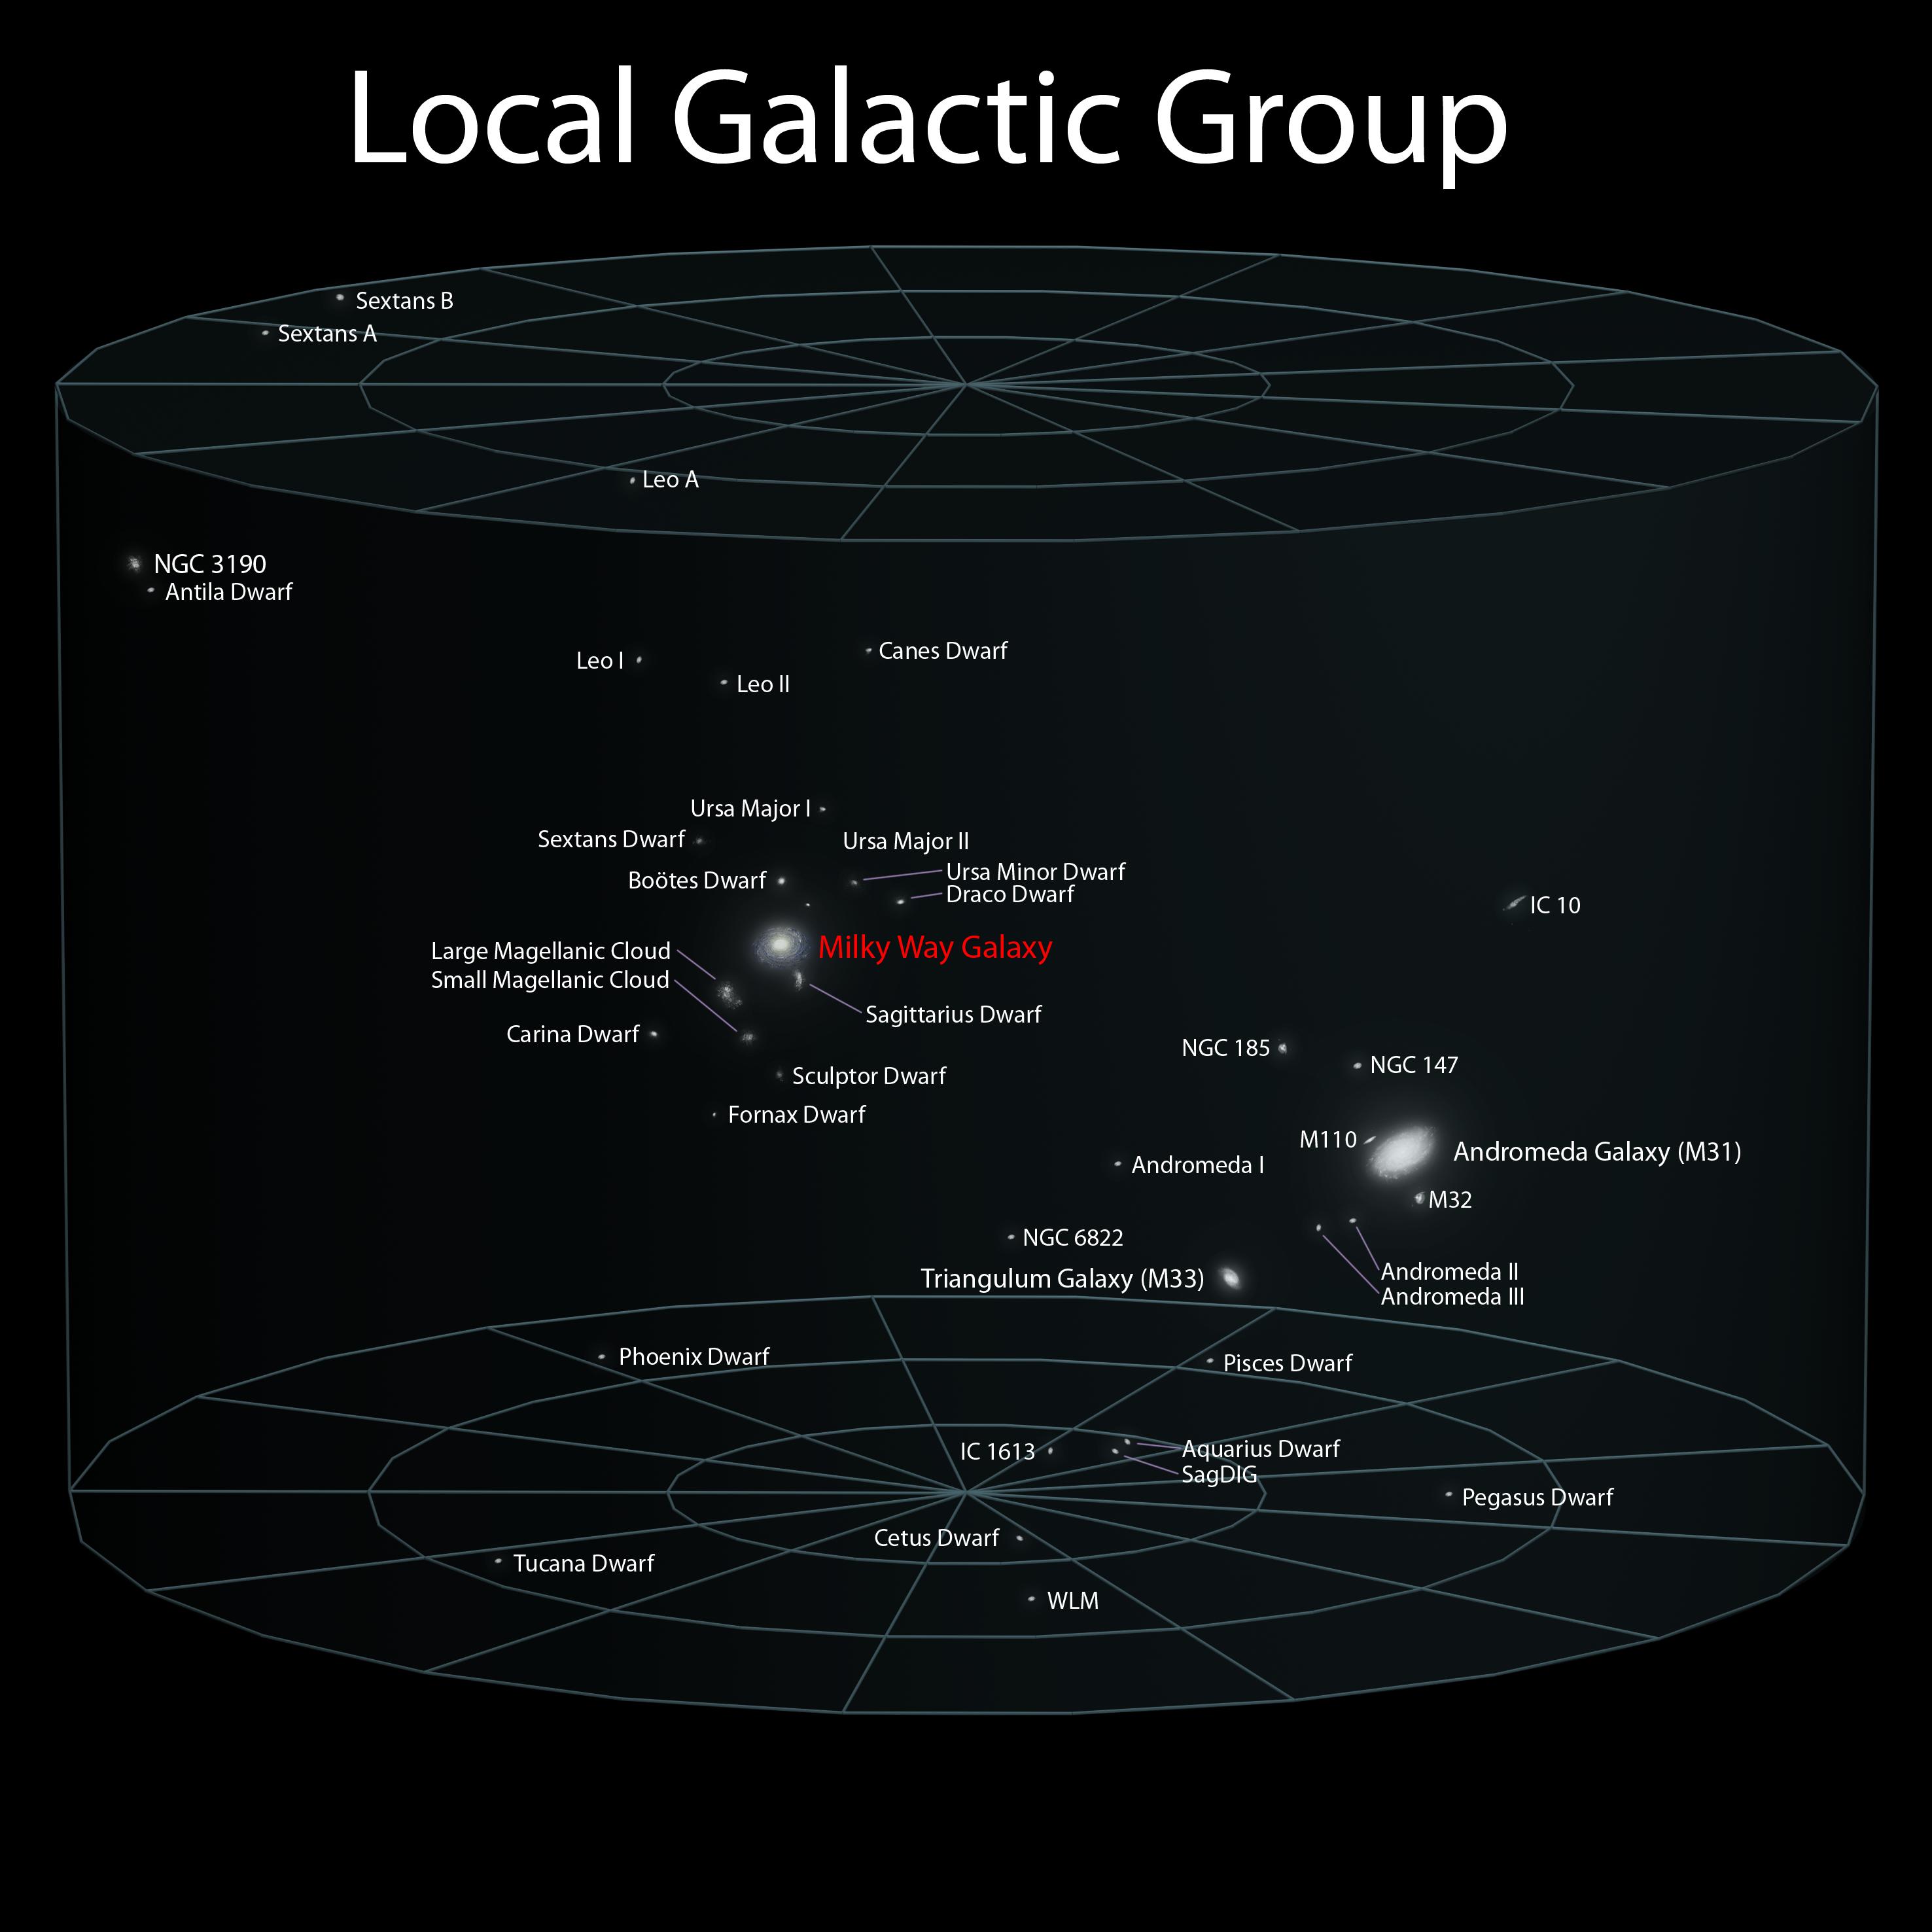 5_Local_Galactic_Group_(ELitU)